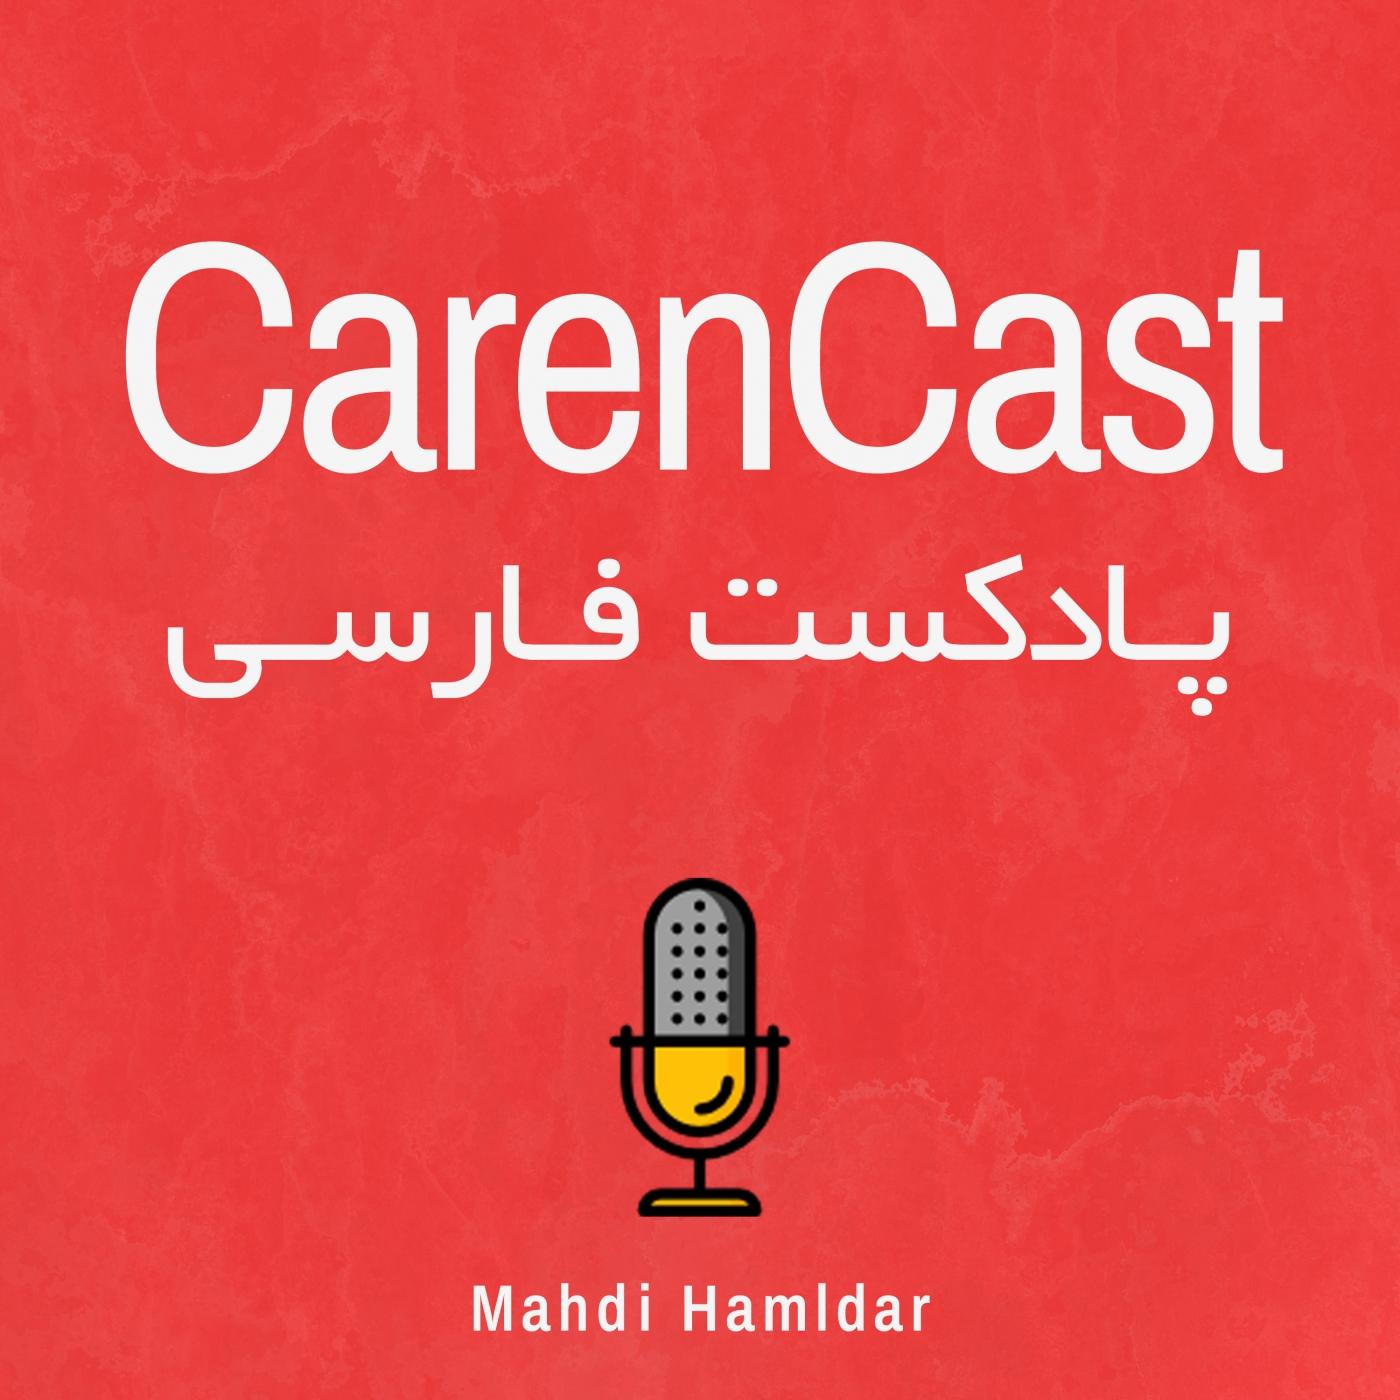 پادکست فارسی CarenCast